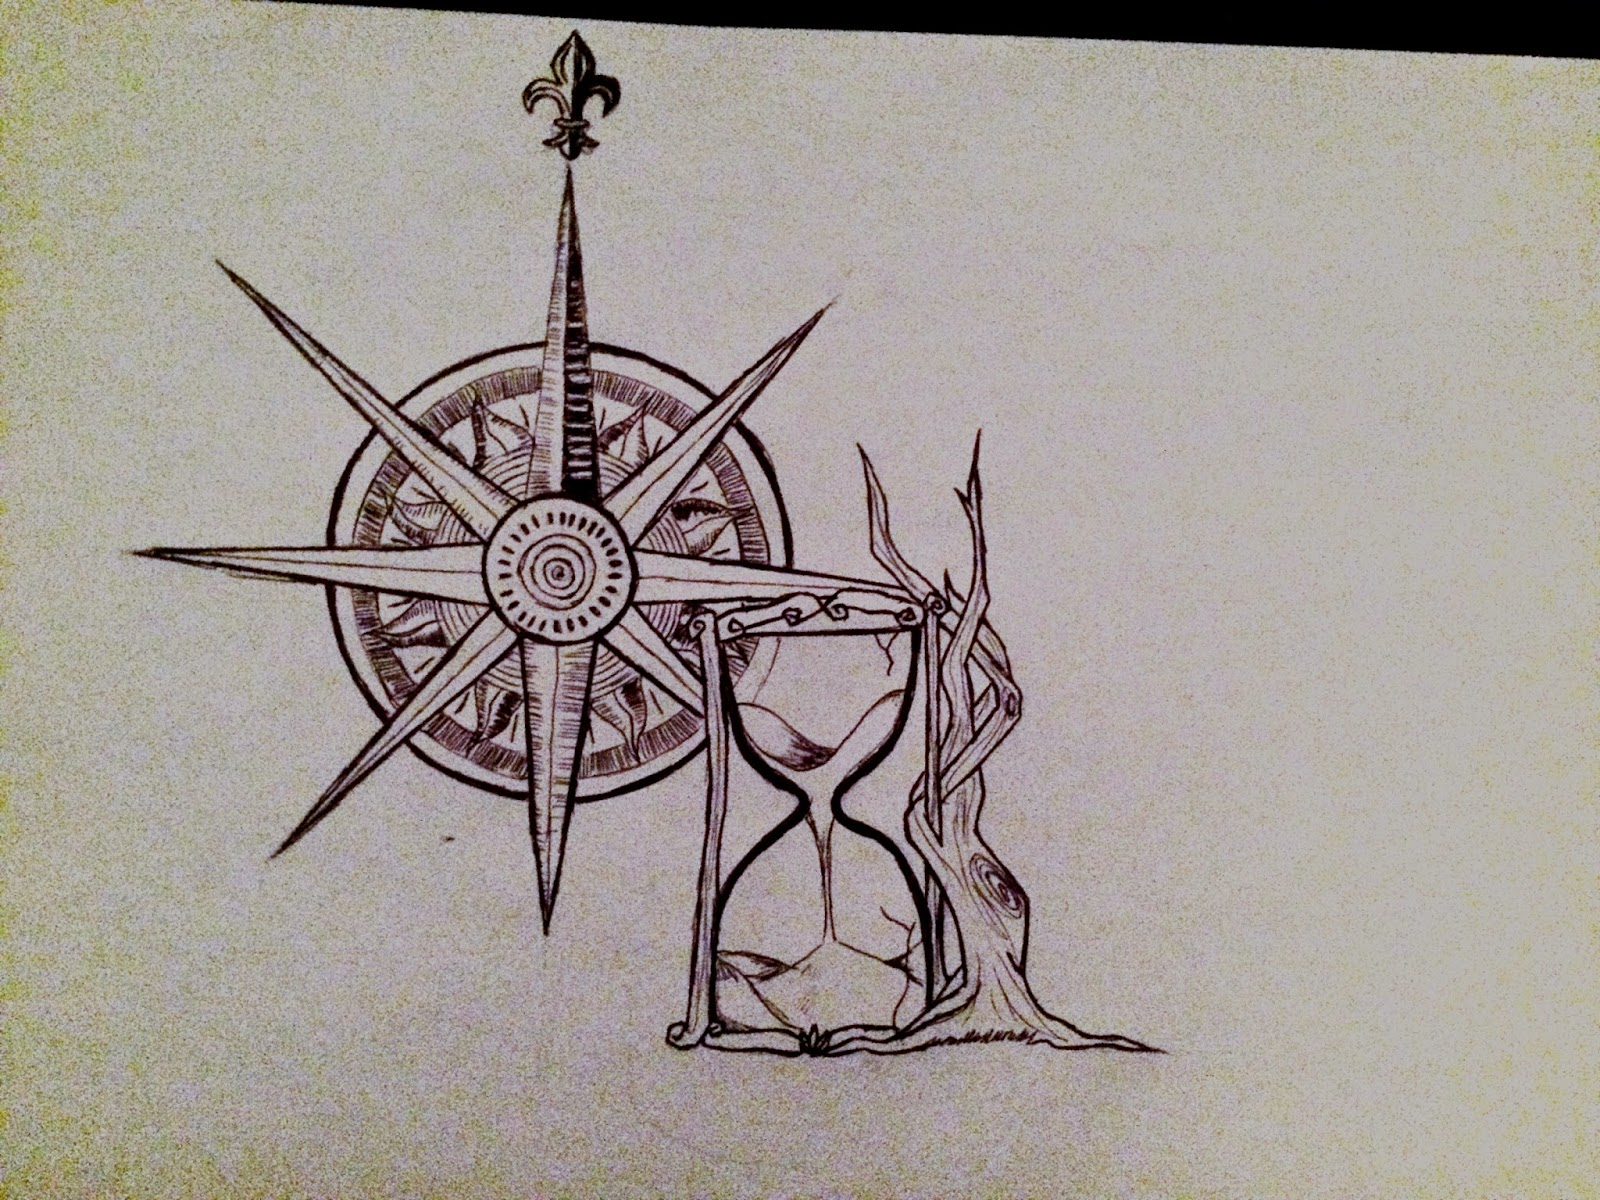 Los Dibujos De Sergio Llorca.: Tattoo Brújula Con Reloj